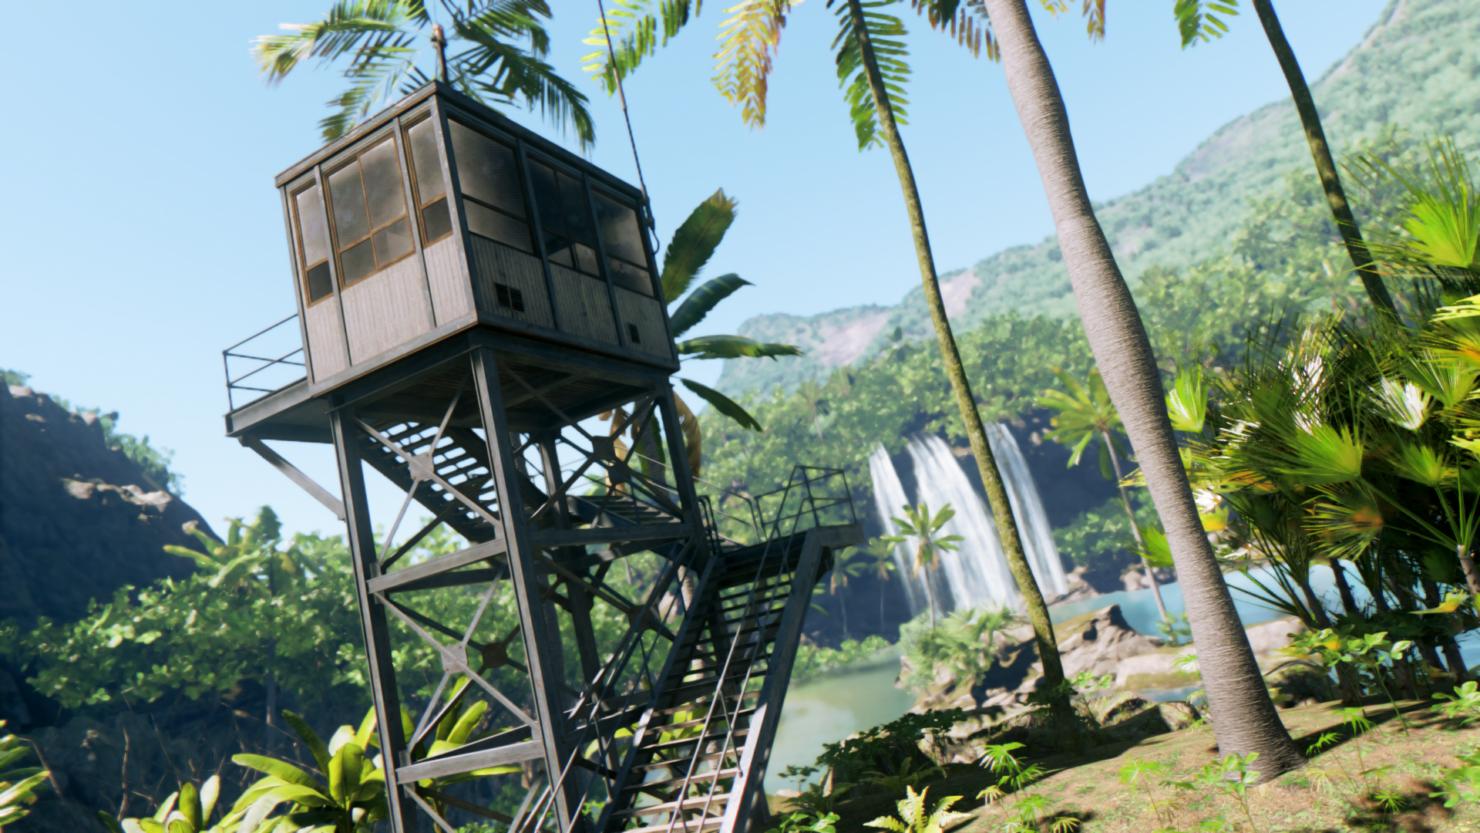 mafia3_dlc2_stones_unturned_screenshot_09_environment_island_mercenary_tower_day